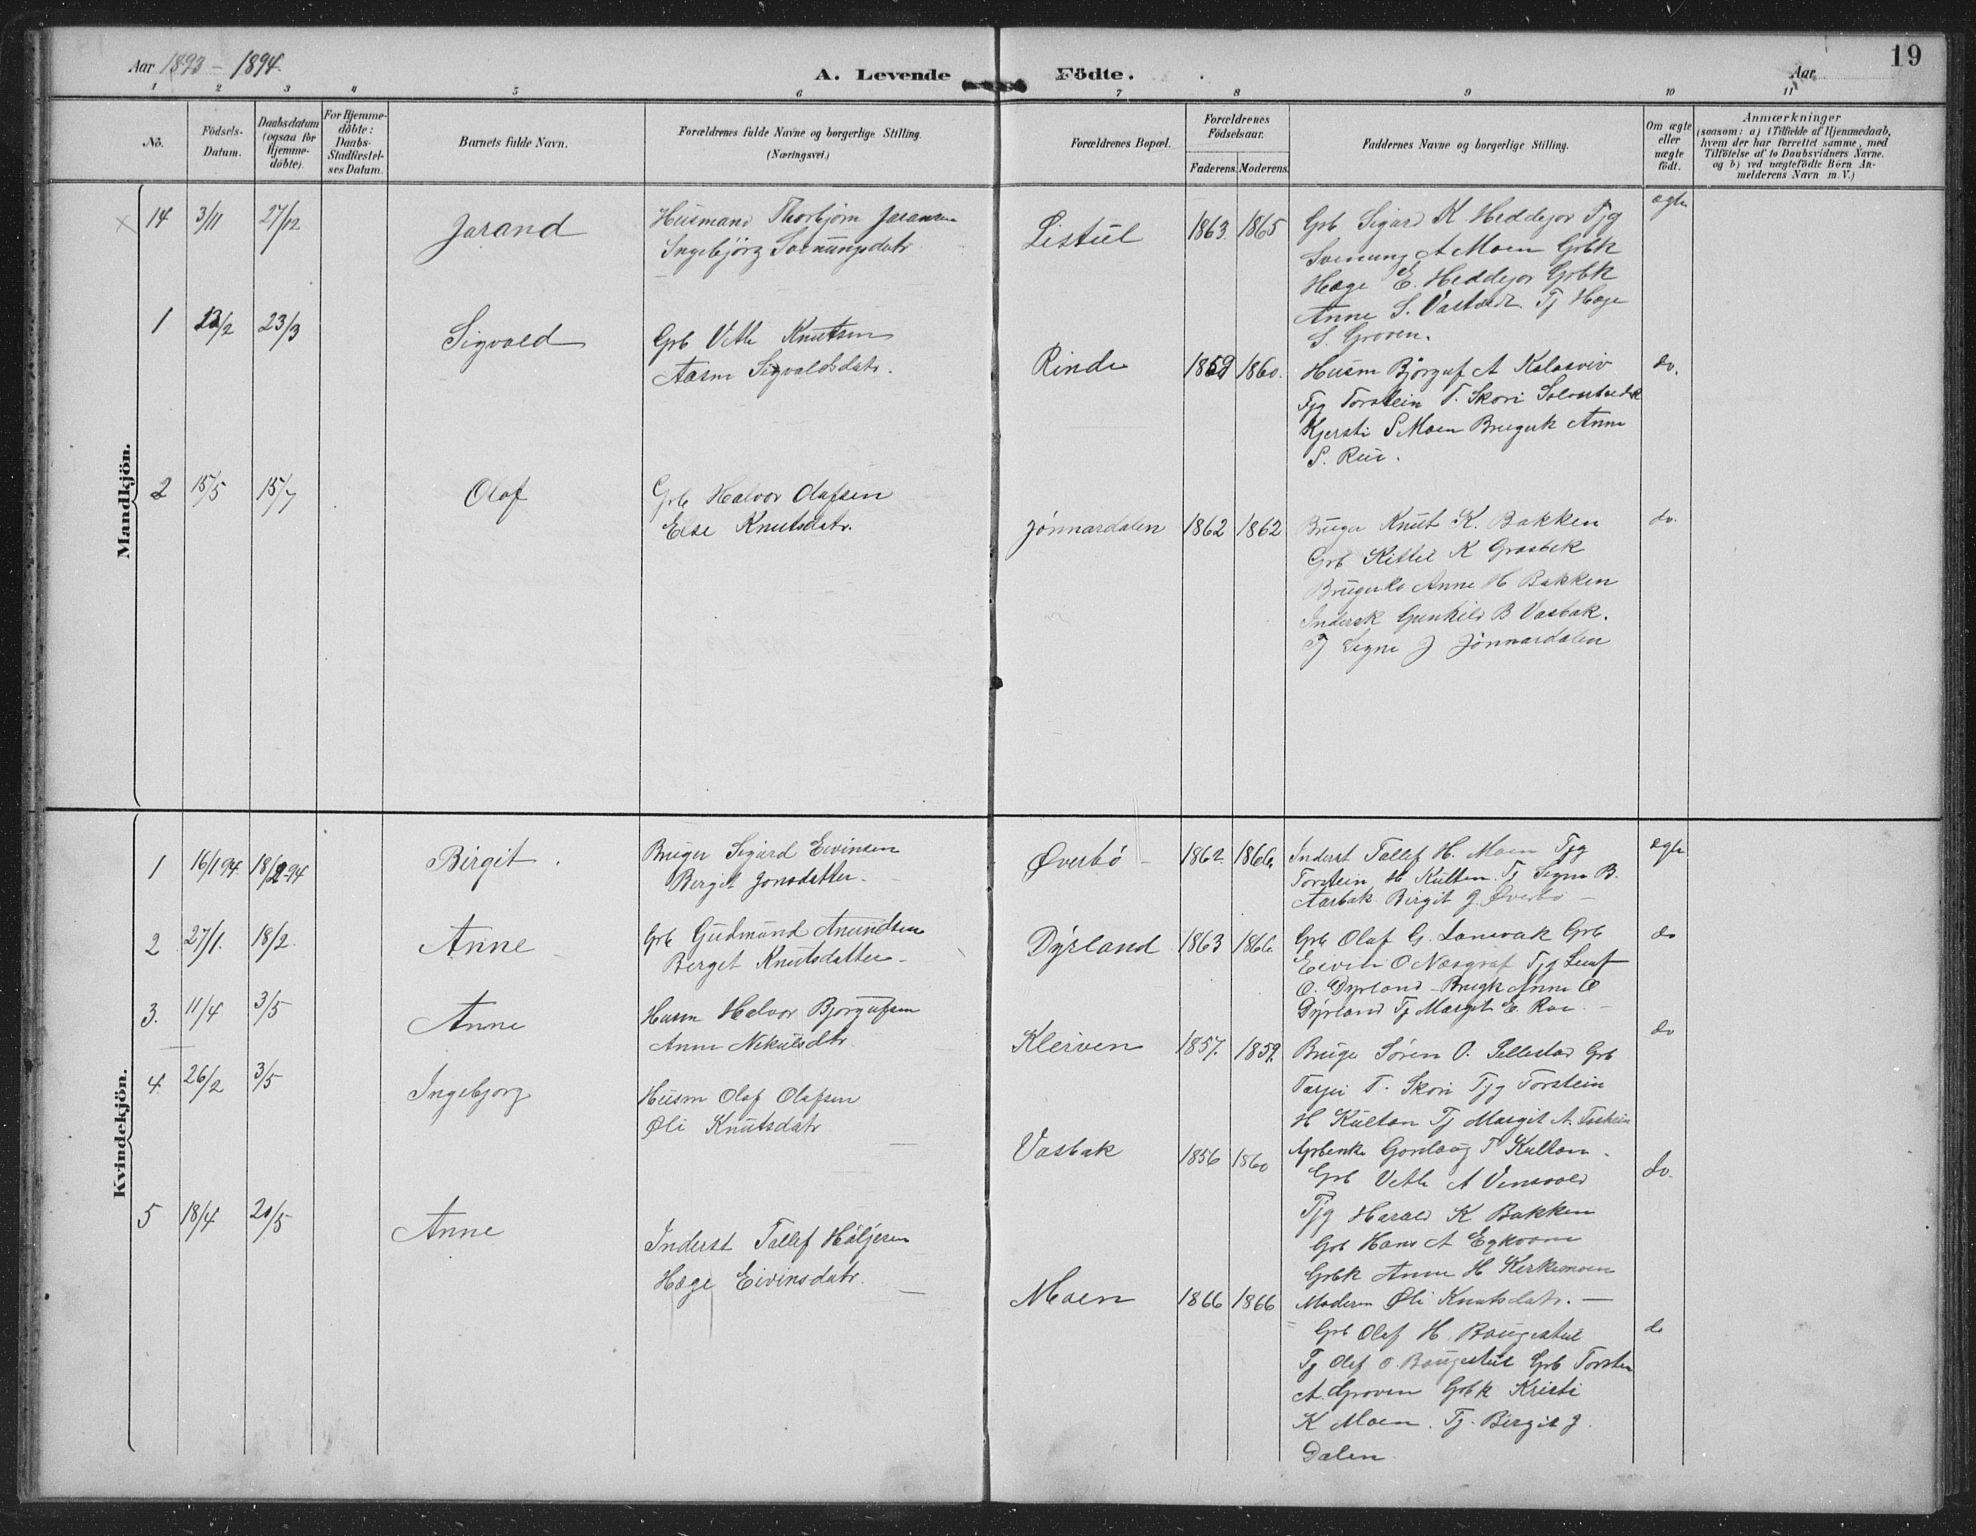 SAKO, Seljord kirkebøker, G/Gc/L0003: Klokkerbok nr. III 3, 1887-1926, s. 19